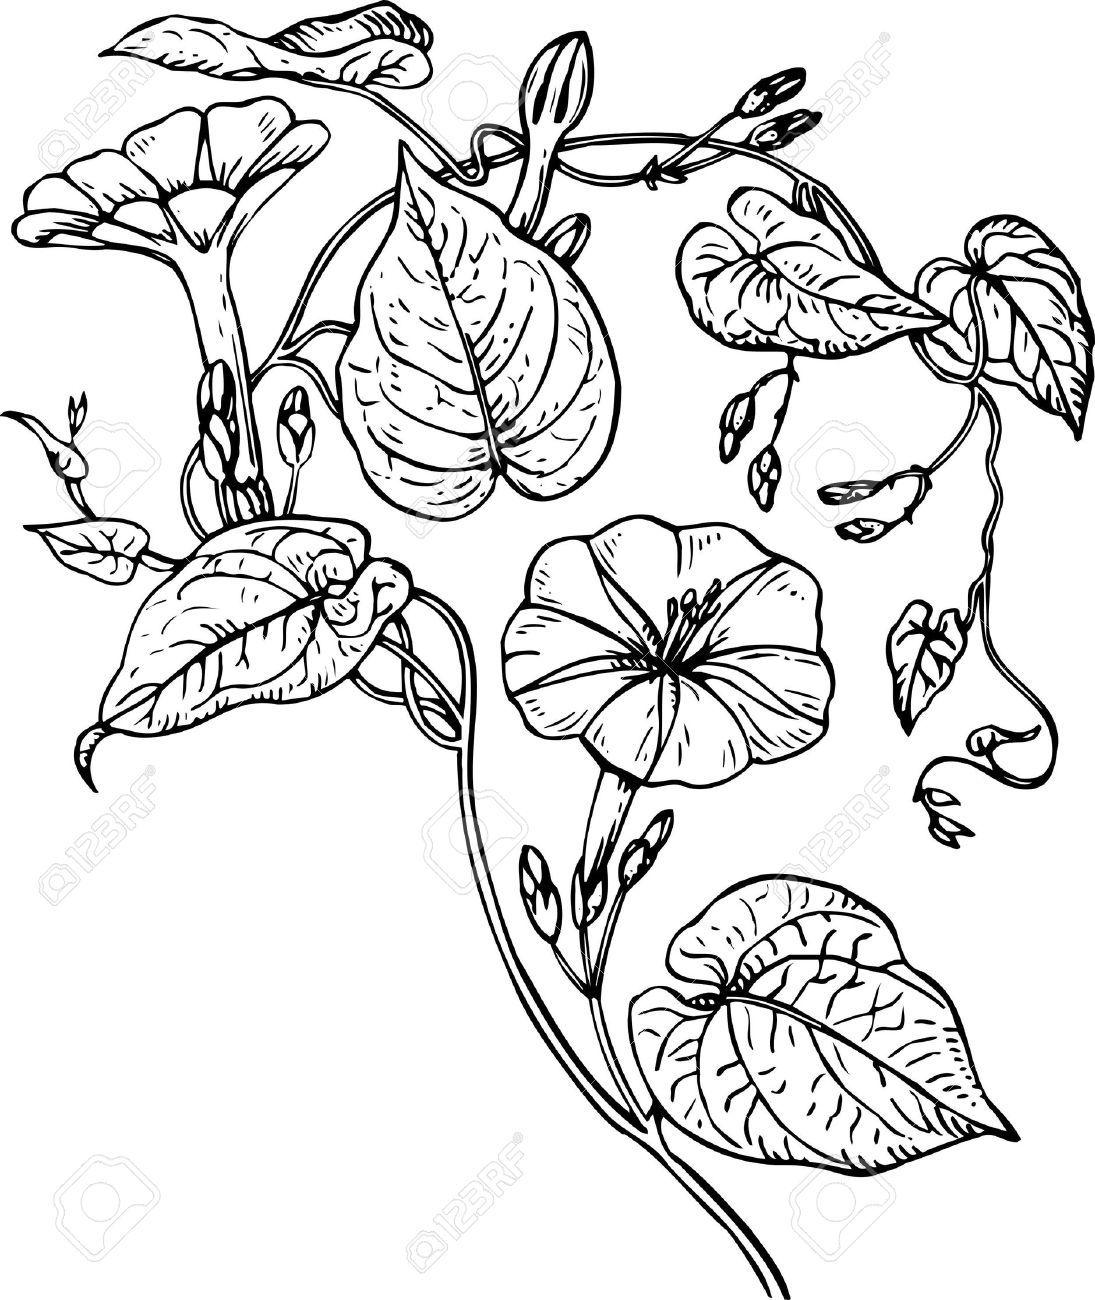 morning glory vine drawing Google Search Vine drawing